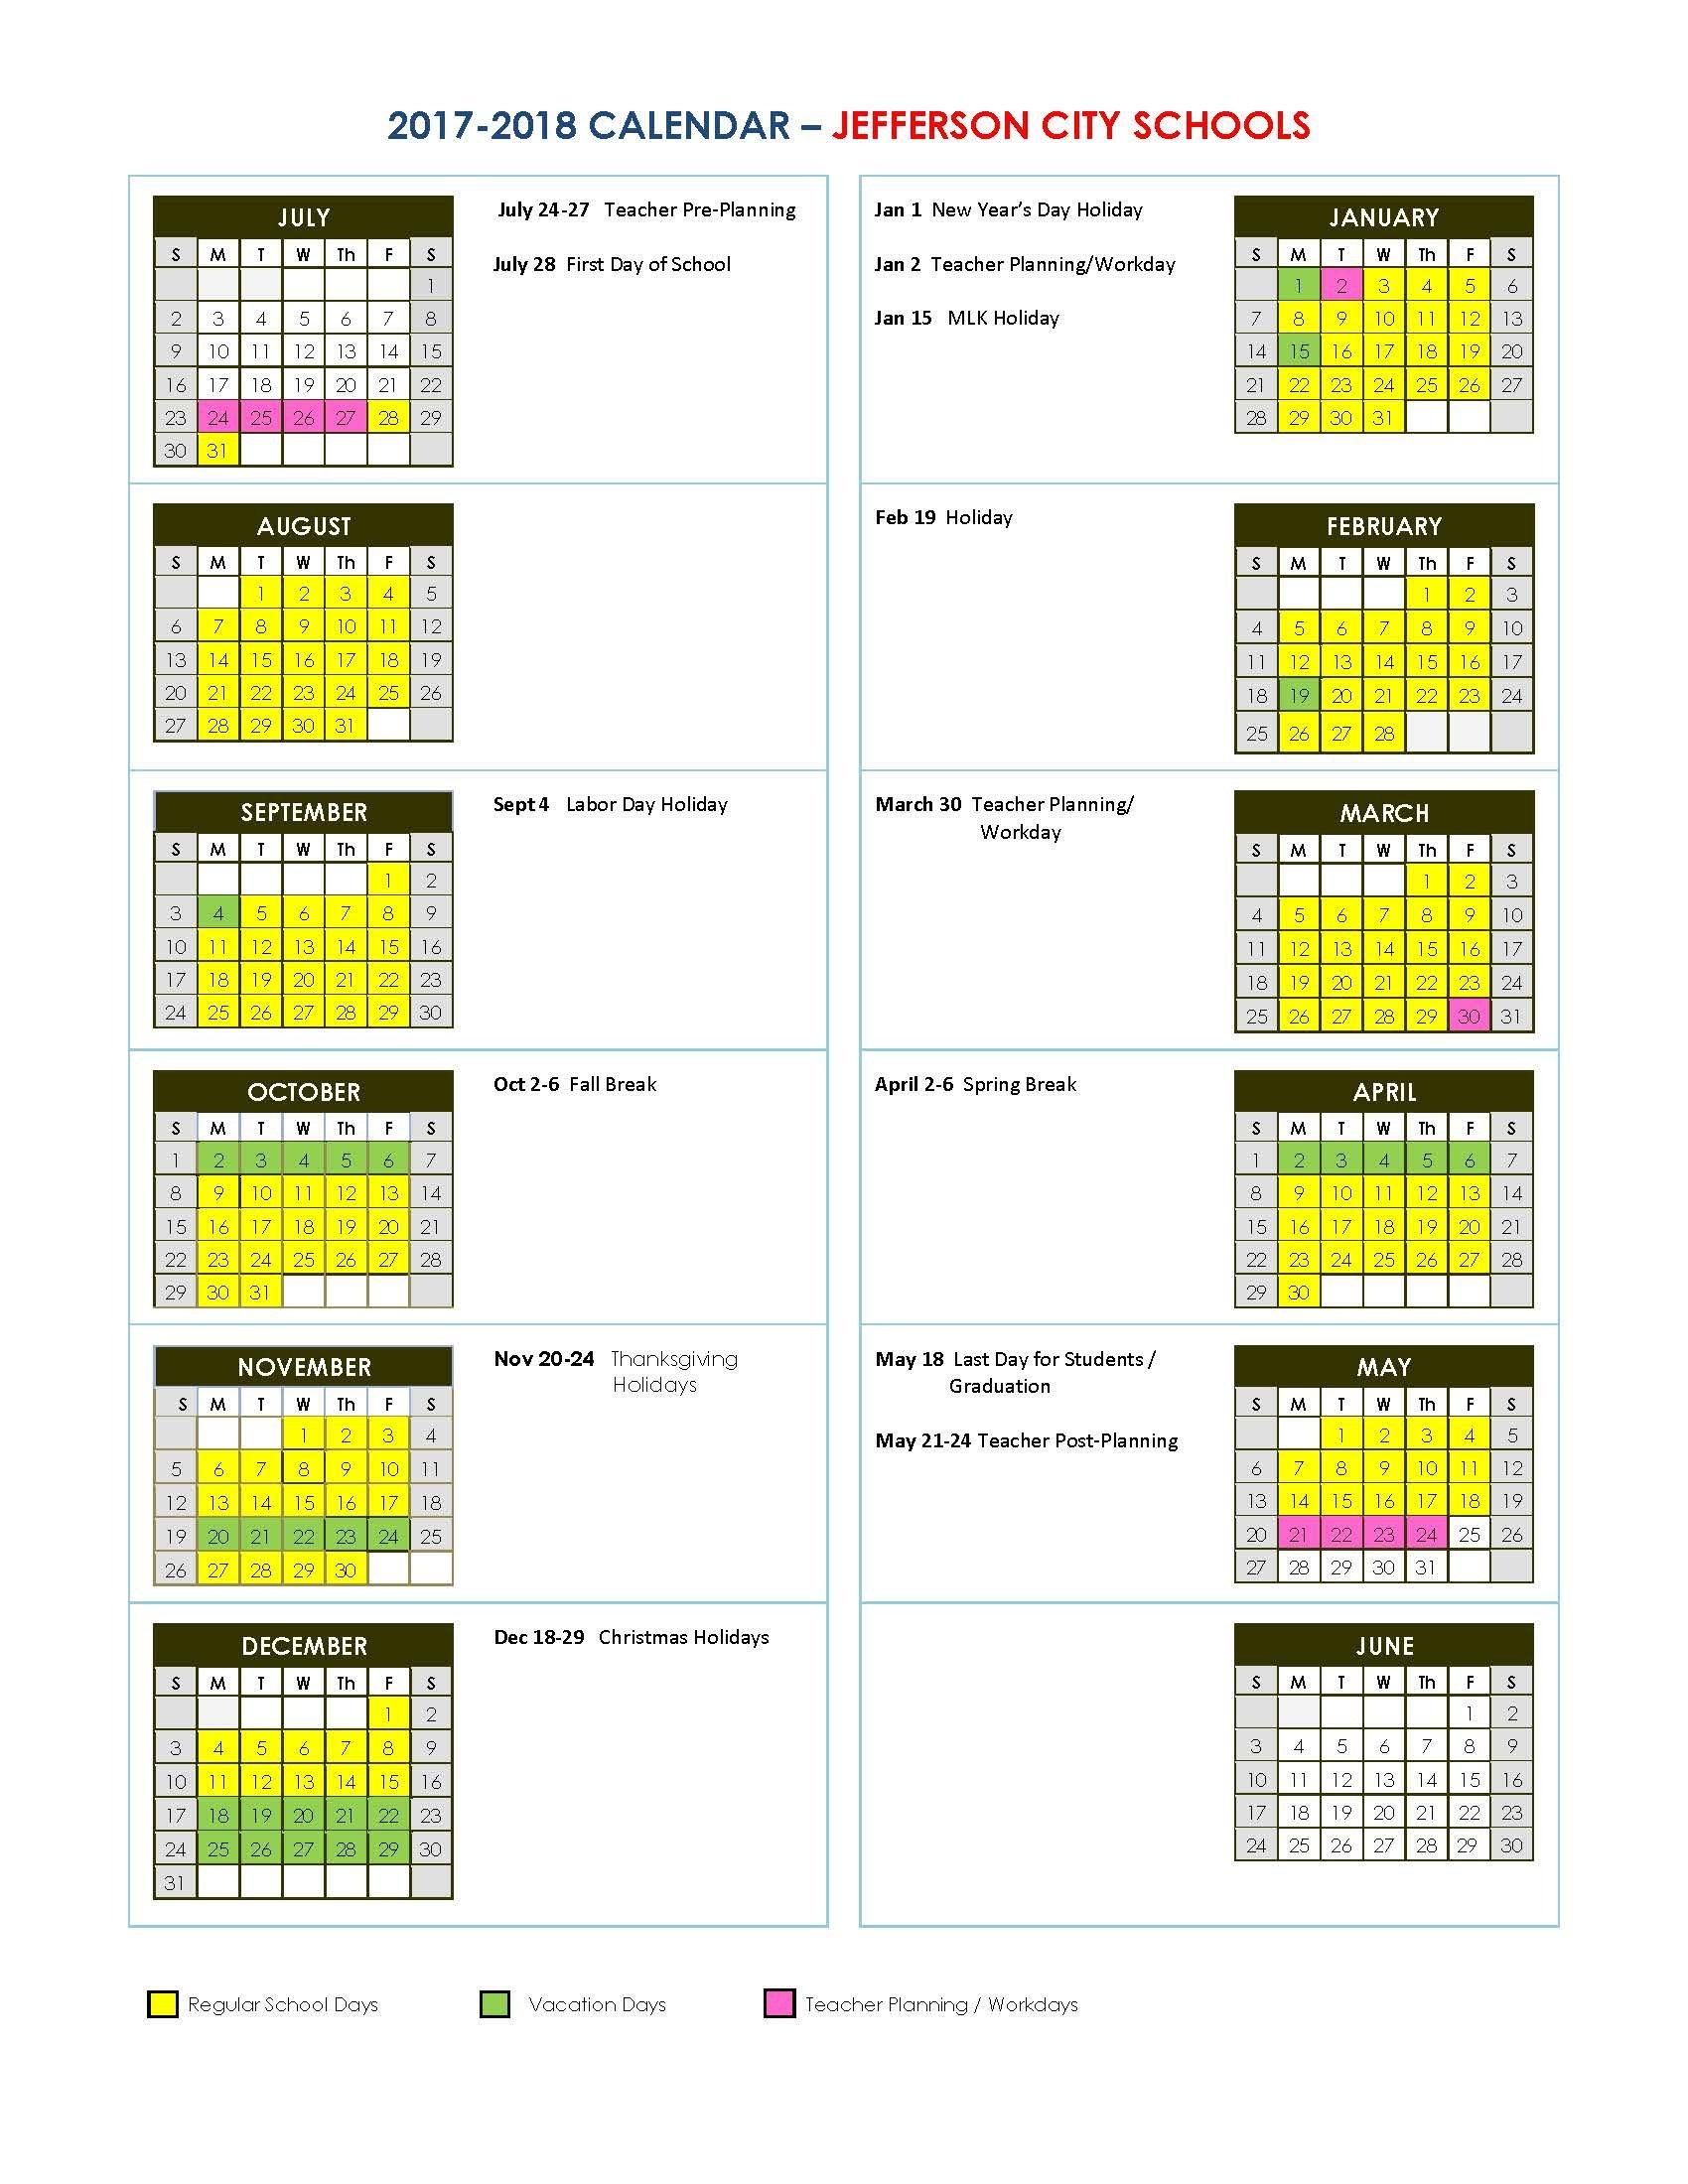 Jefferson City Schools Uga Academic Calendar 2019-20